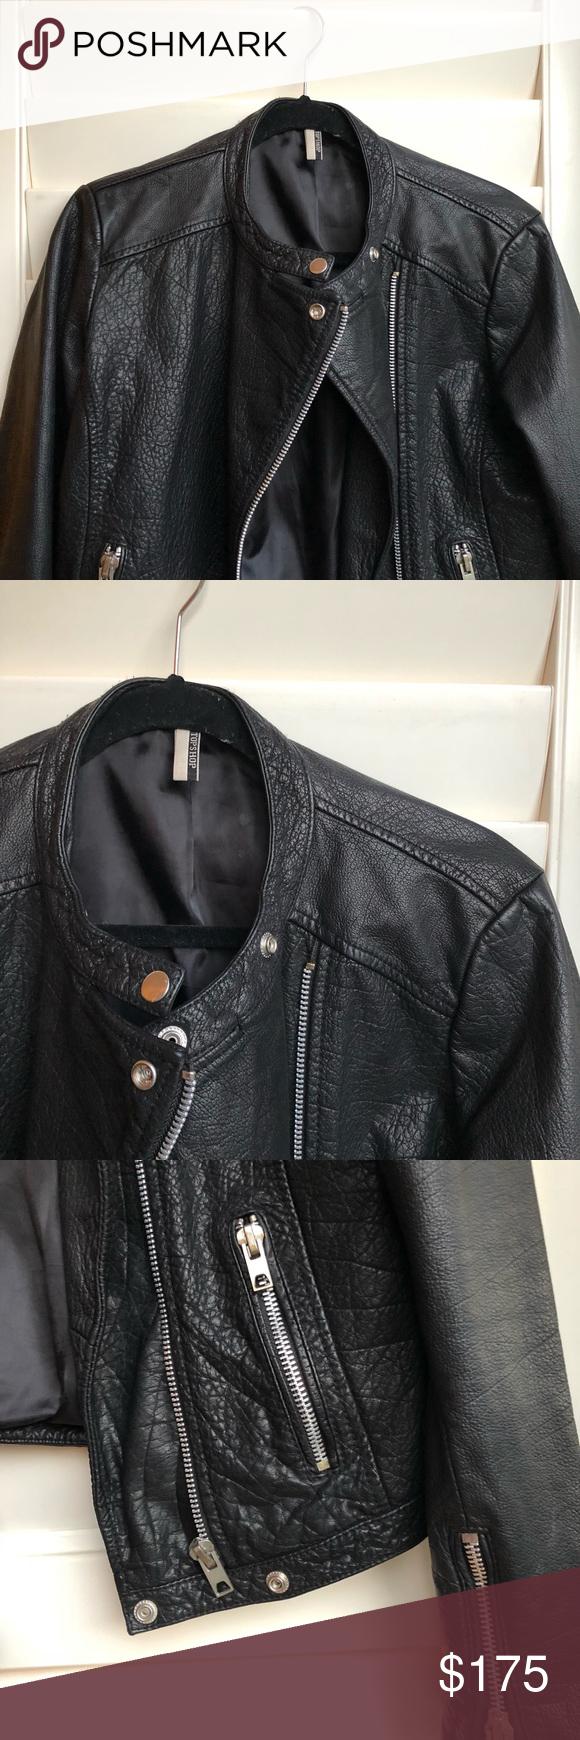 Leather Biker Jacket Jackets, Biker jacket